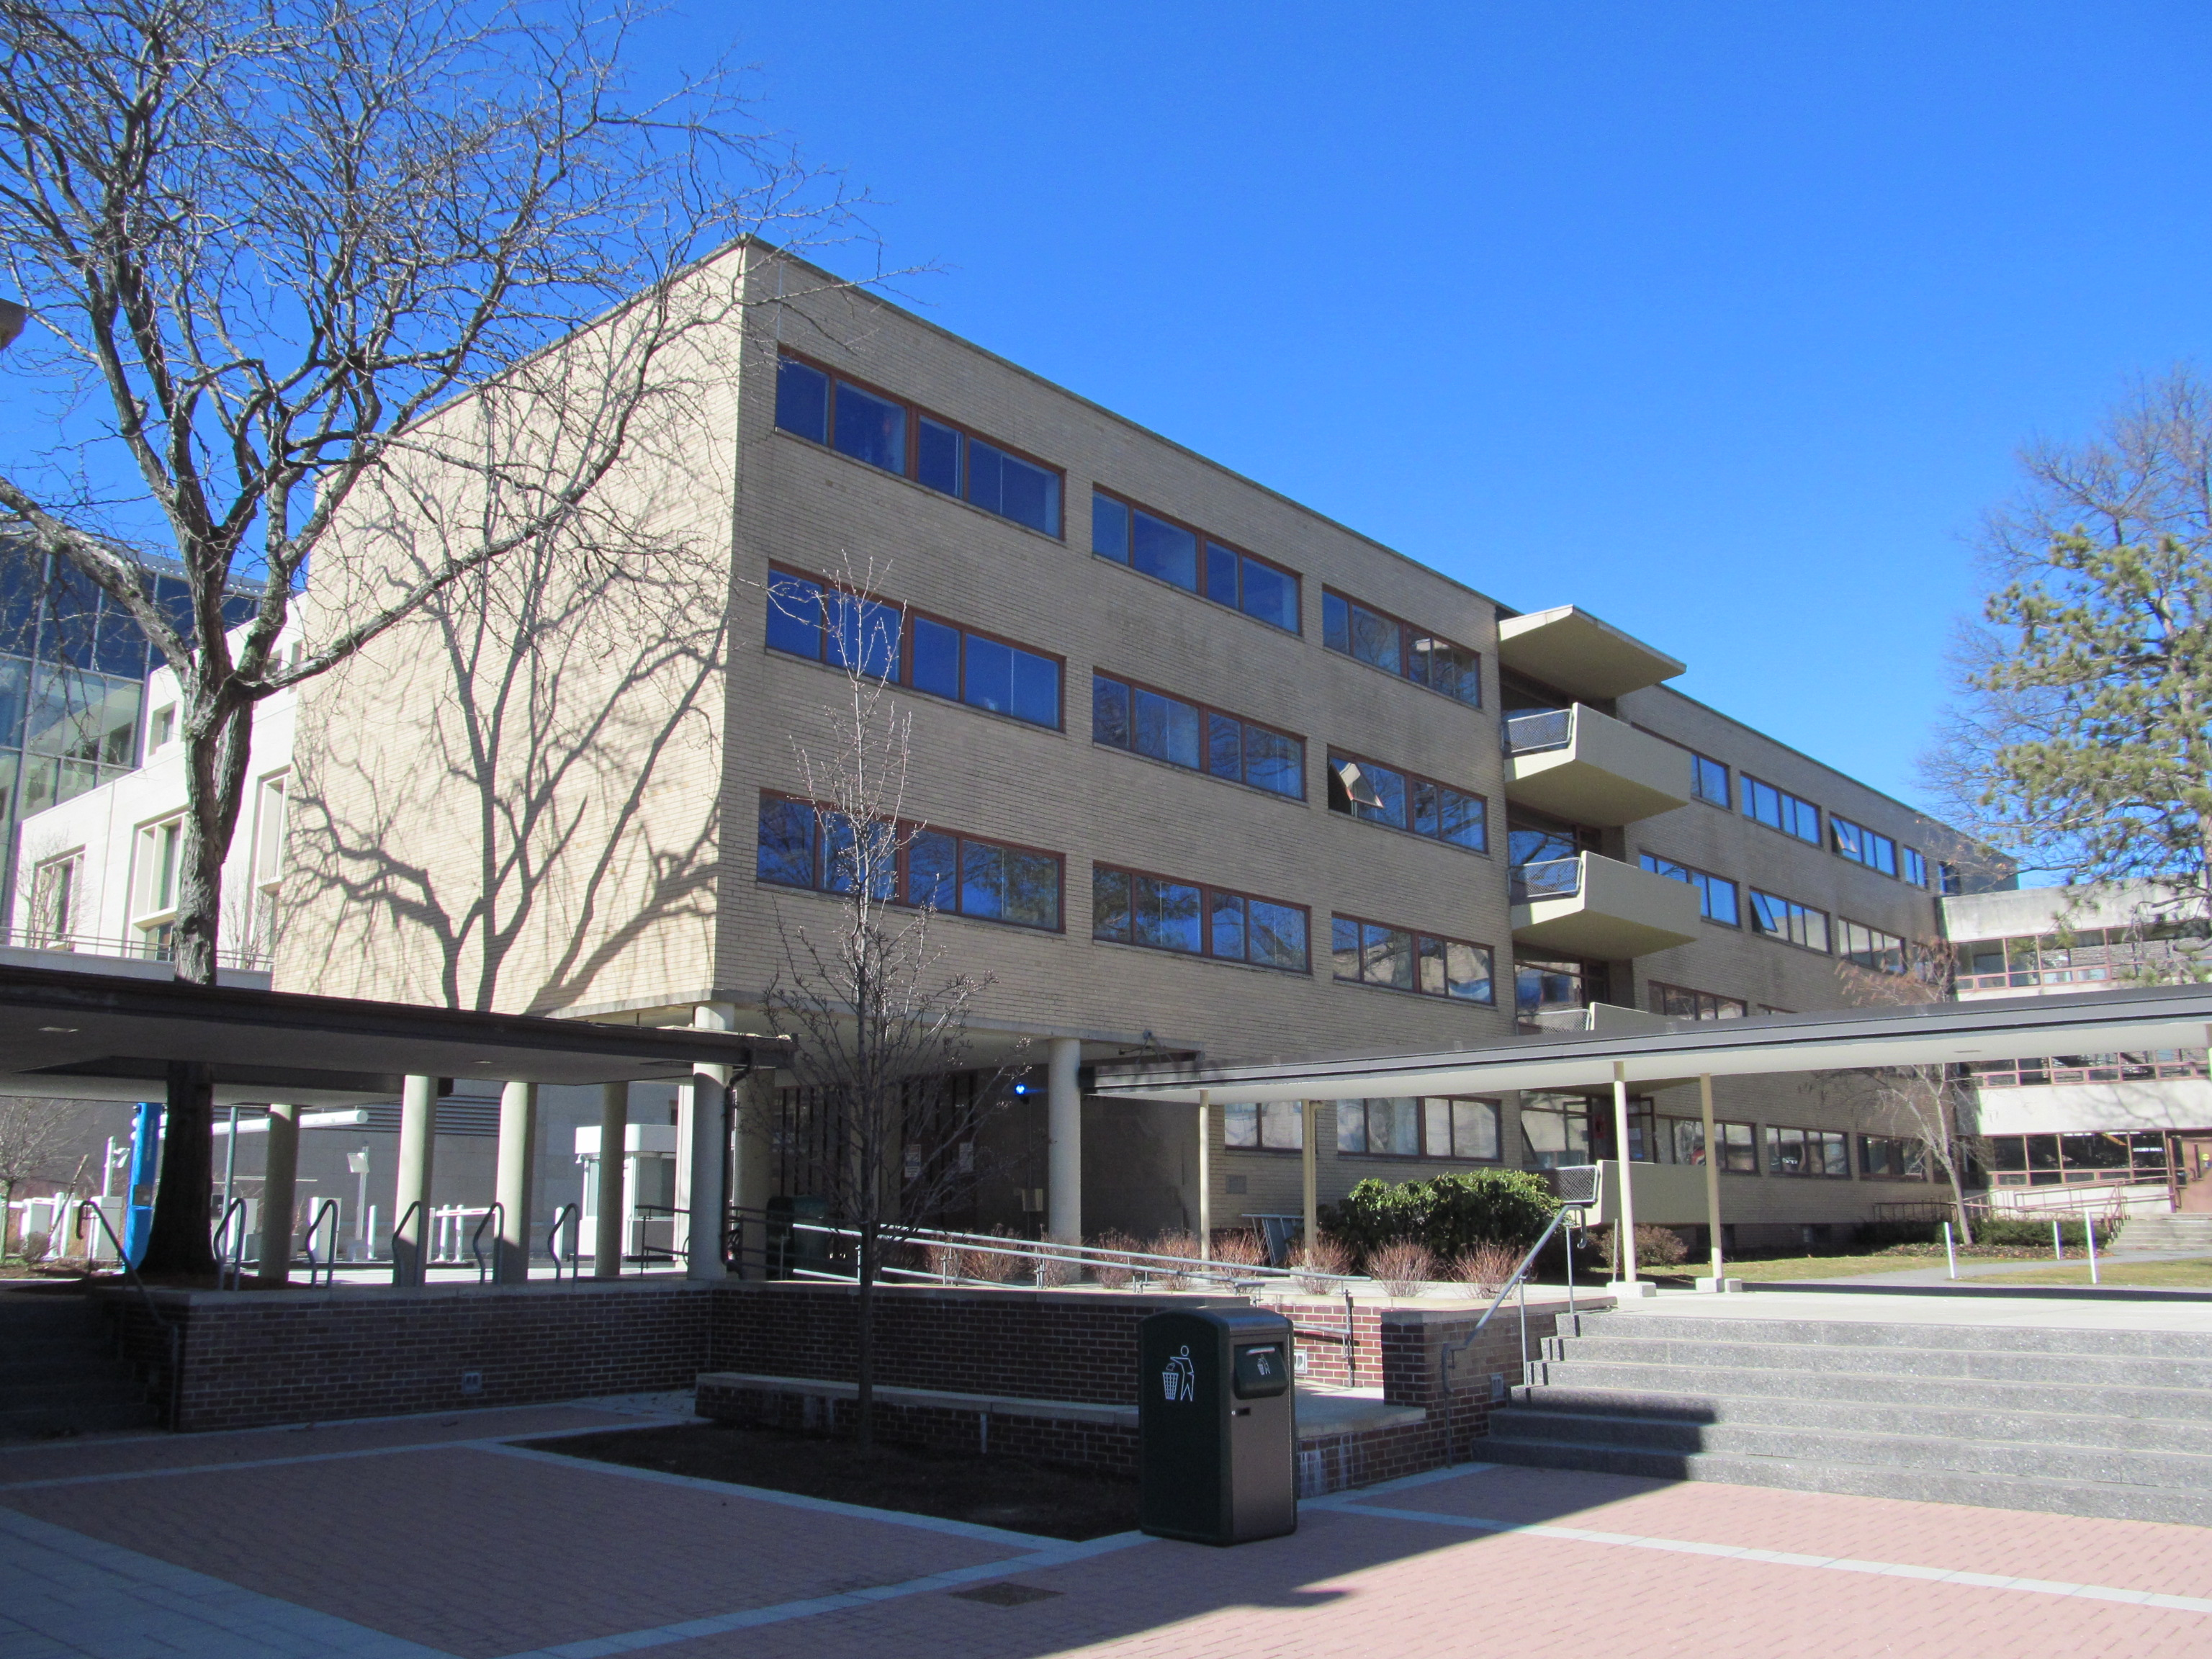 Harvard Graduate Center - Wikipedia